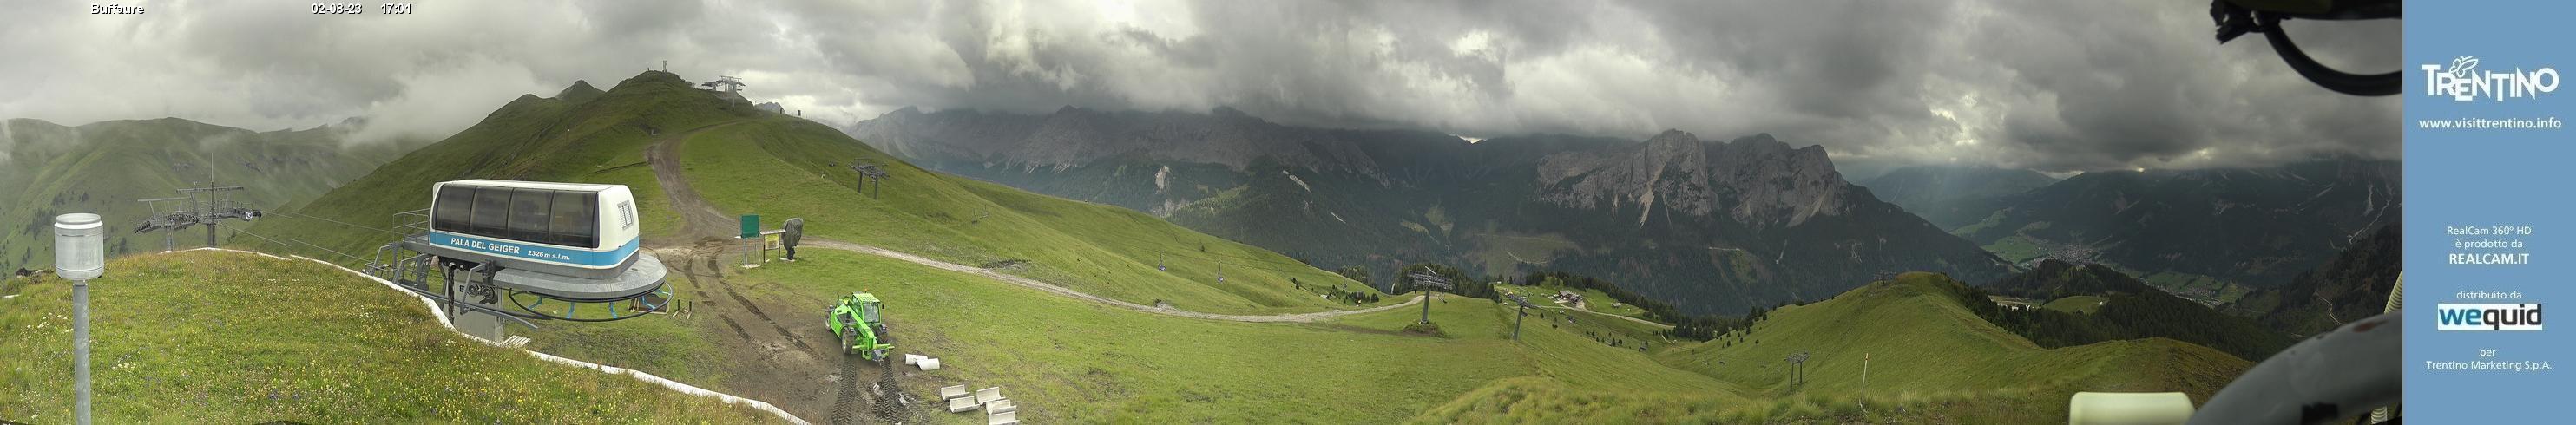 Webcam Panoramica Col de Valvacin - Buffaure, Val di Fassa